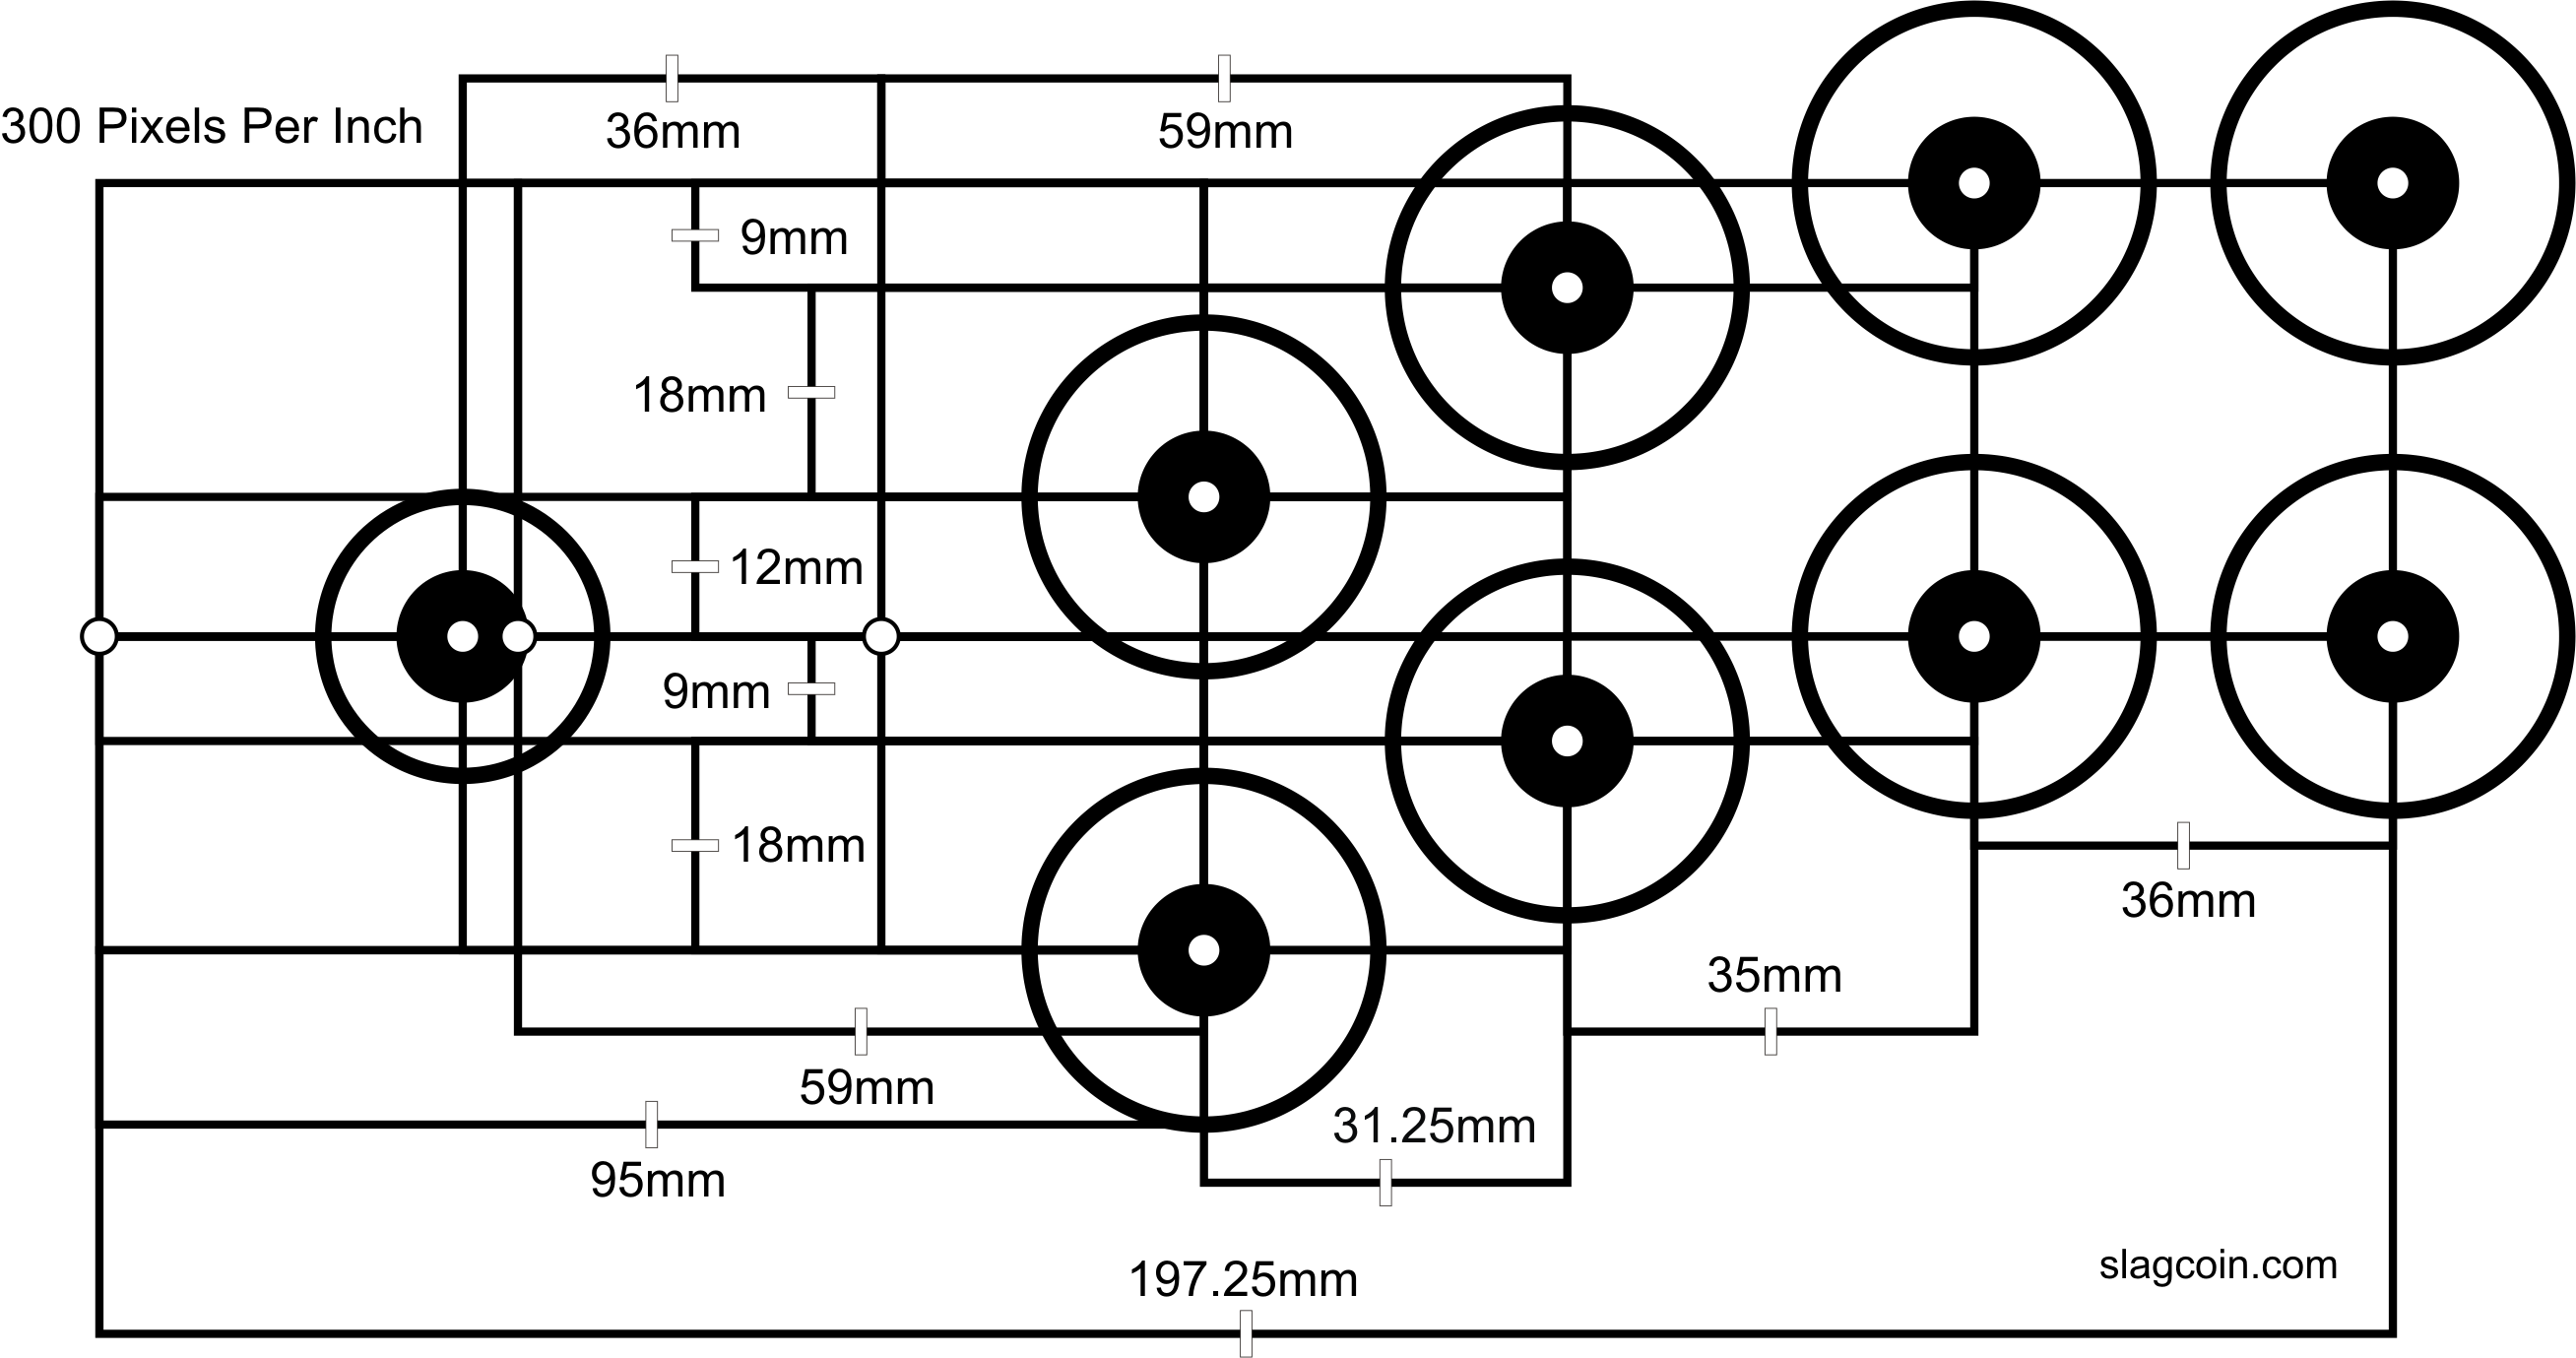 joystick controller panel layoutNeo Geo Arcade Stick Wiring Diagram #21